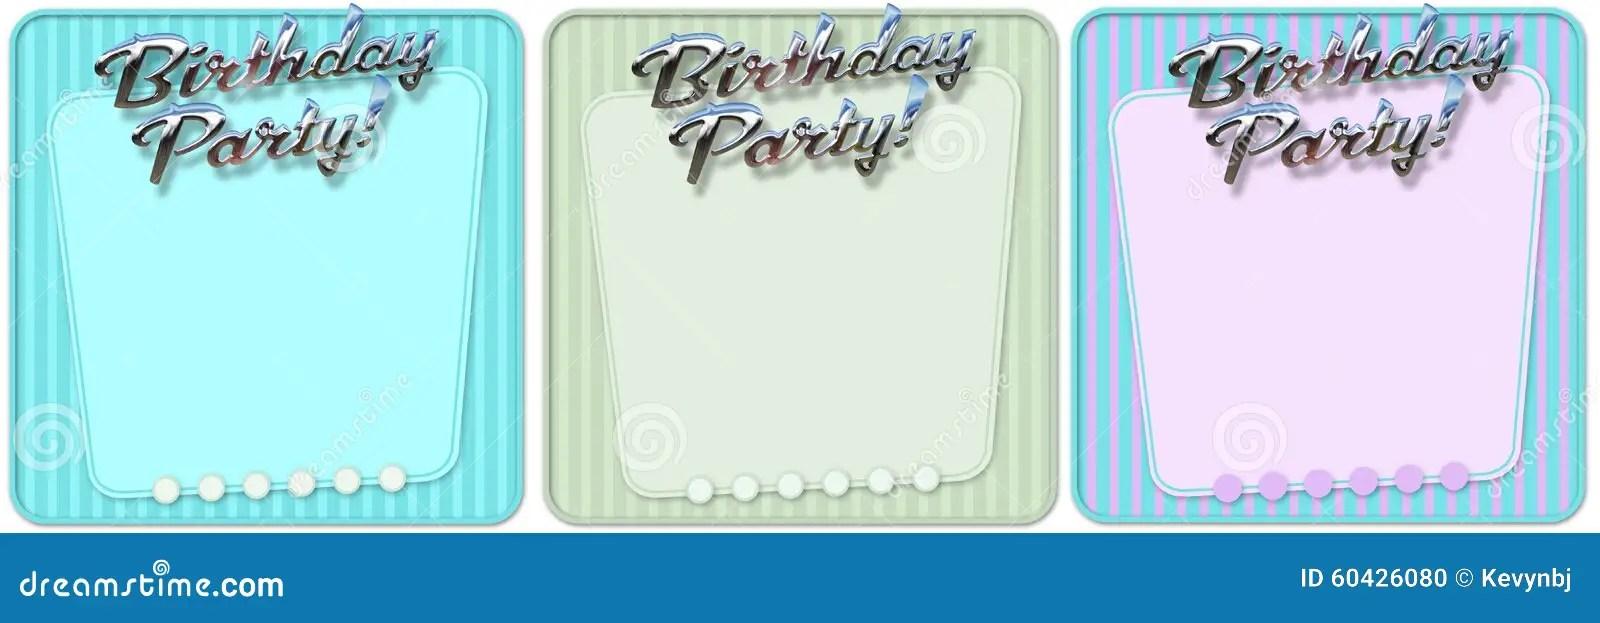 Birthday Party Invitation stock illustration Illustration of